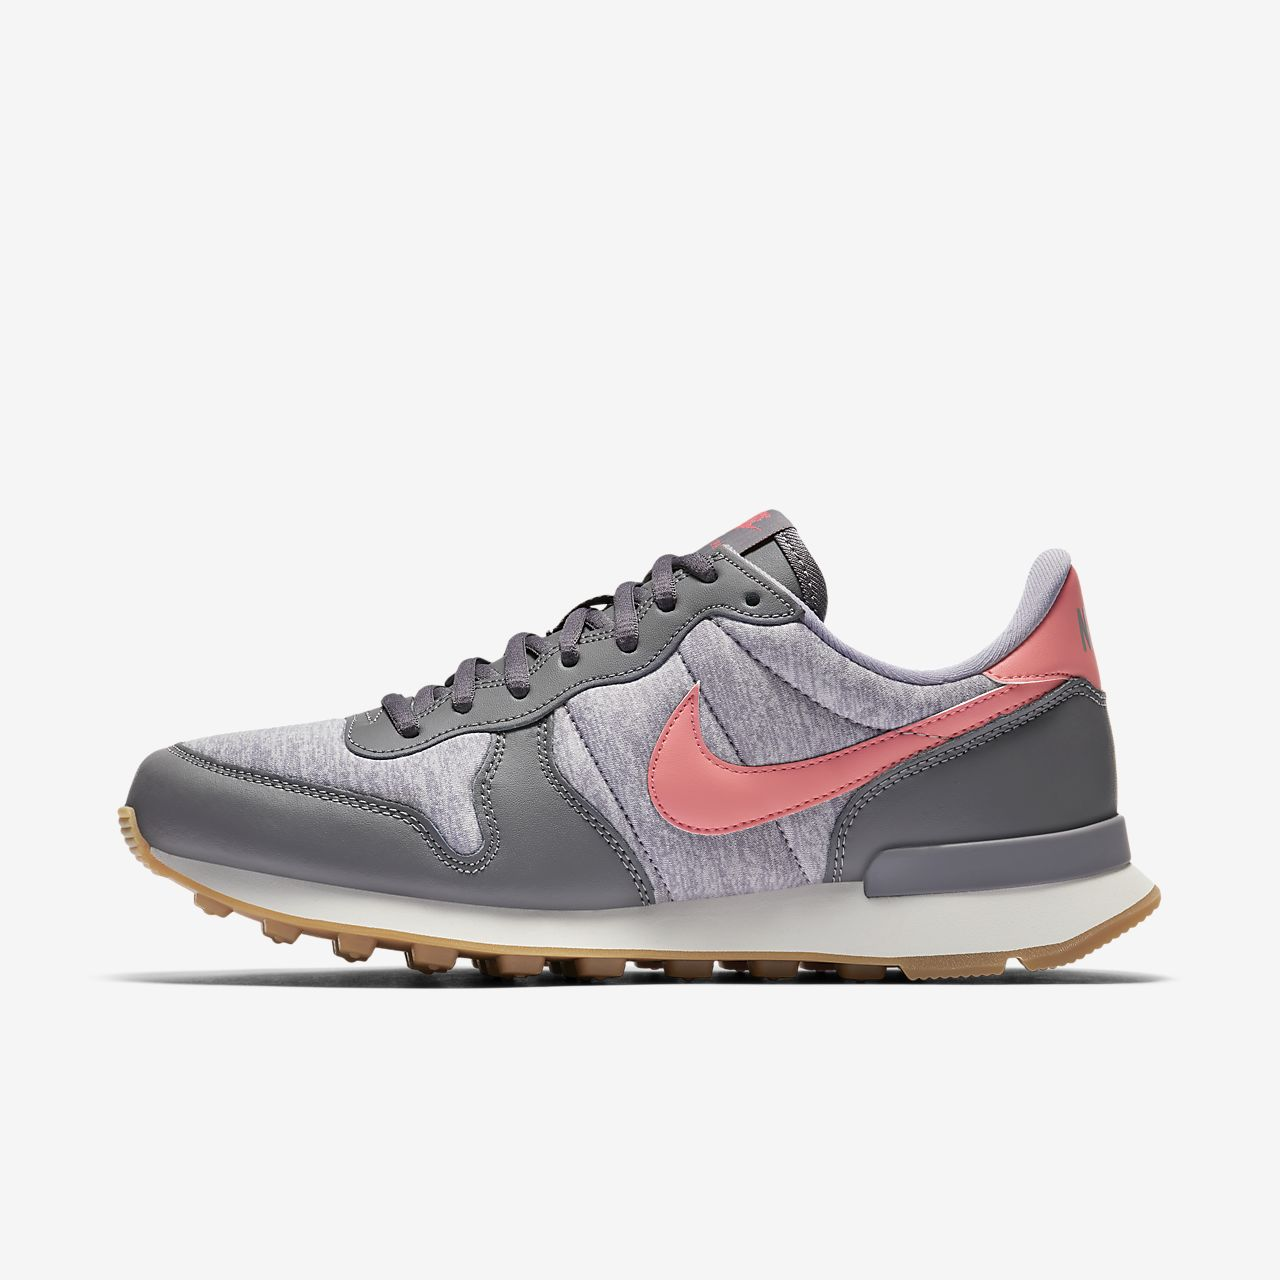 Low Resolution Nike Internationalist Womens Shoe Nike Internationalist Womens Shoe